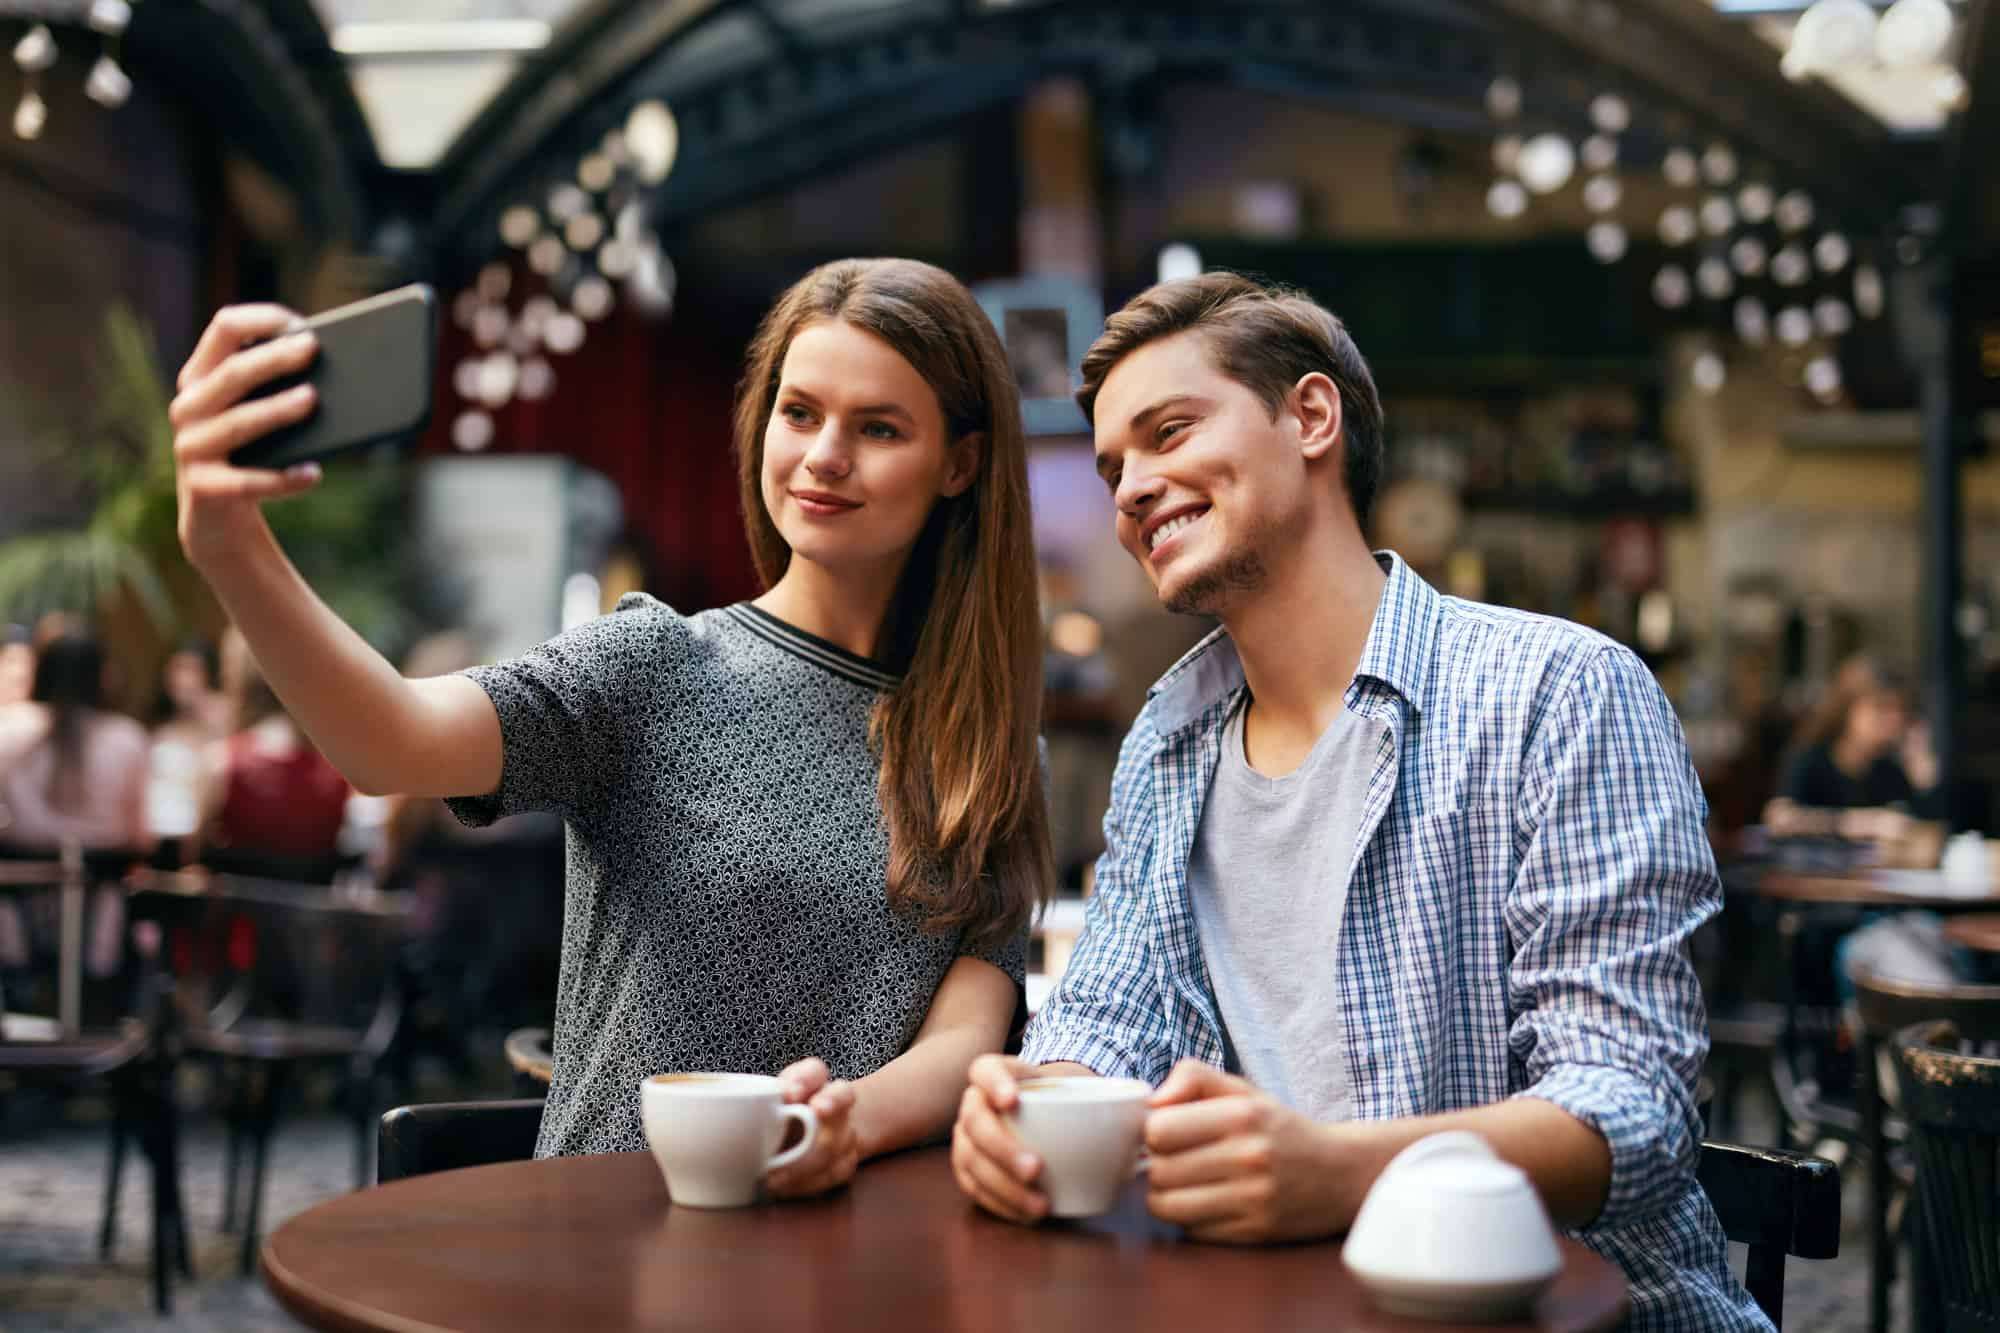 dating sweden sund- svinhult s: t olof romantisk dejt